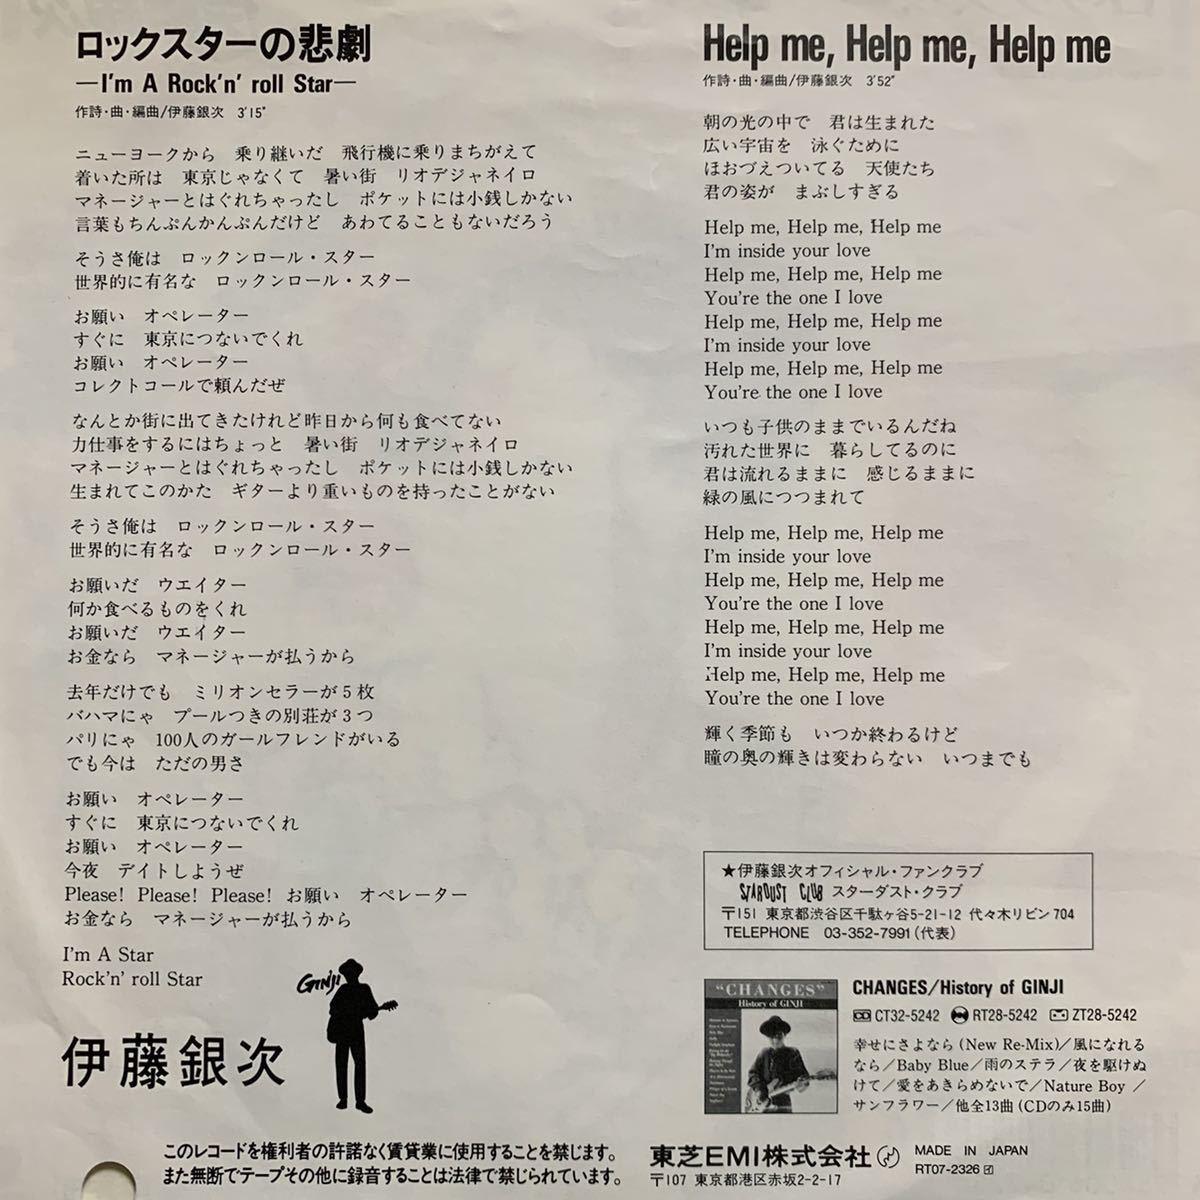 【EP】【7インチレコード】激レア 非売品 見本盤 伊藤銀次 / ロックスターの悲劇 / Help me,Help me,Help me 和モノ 極上 シティポップ_画像2